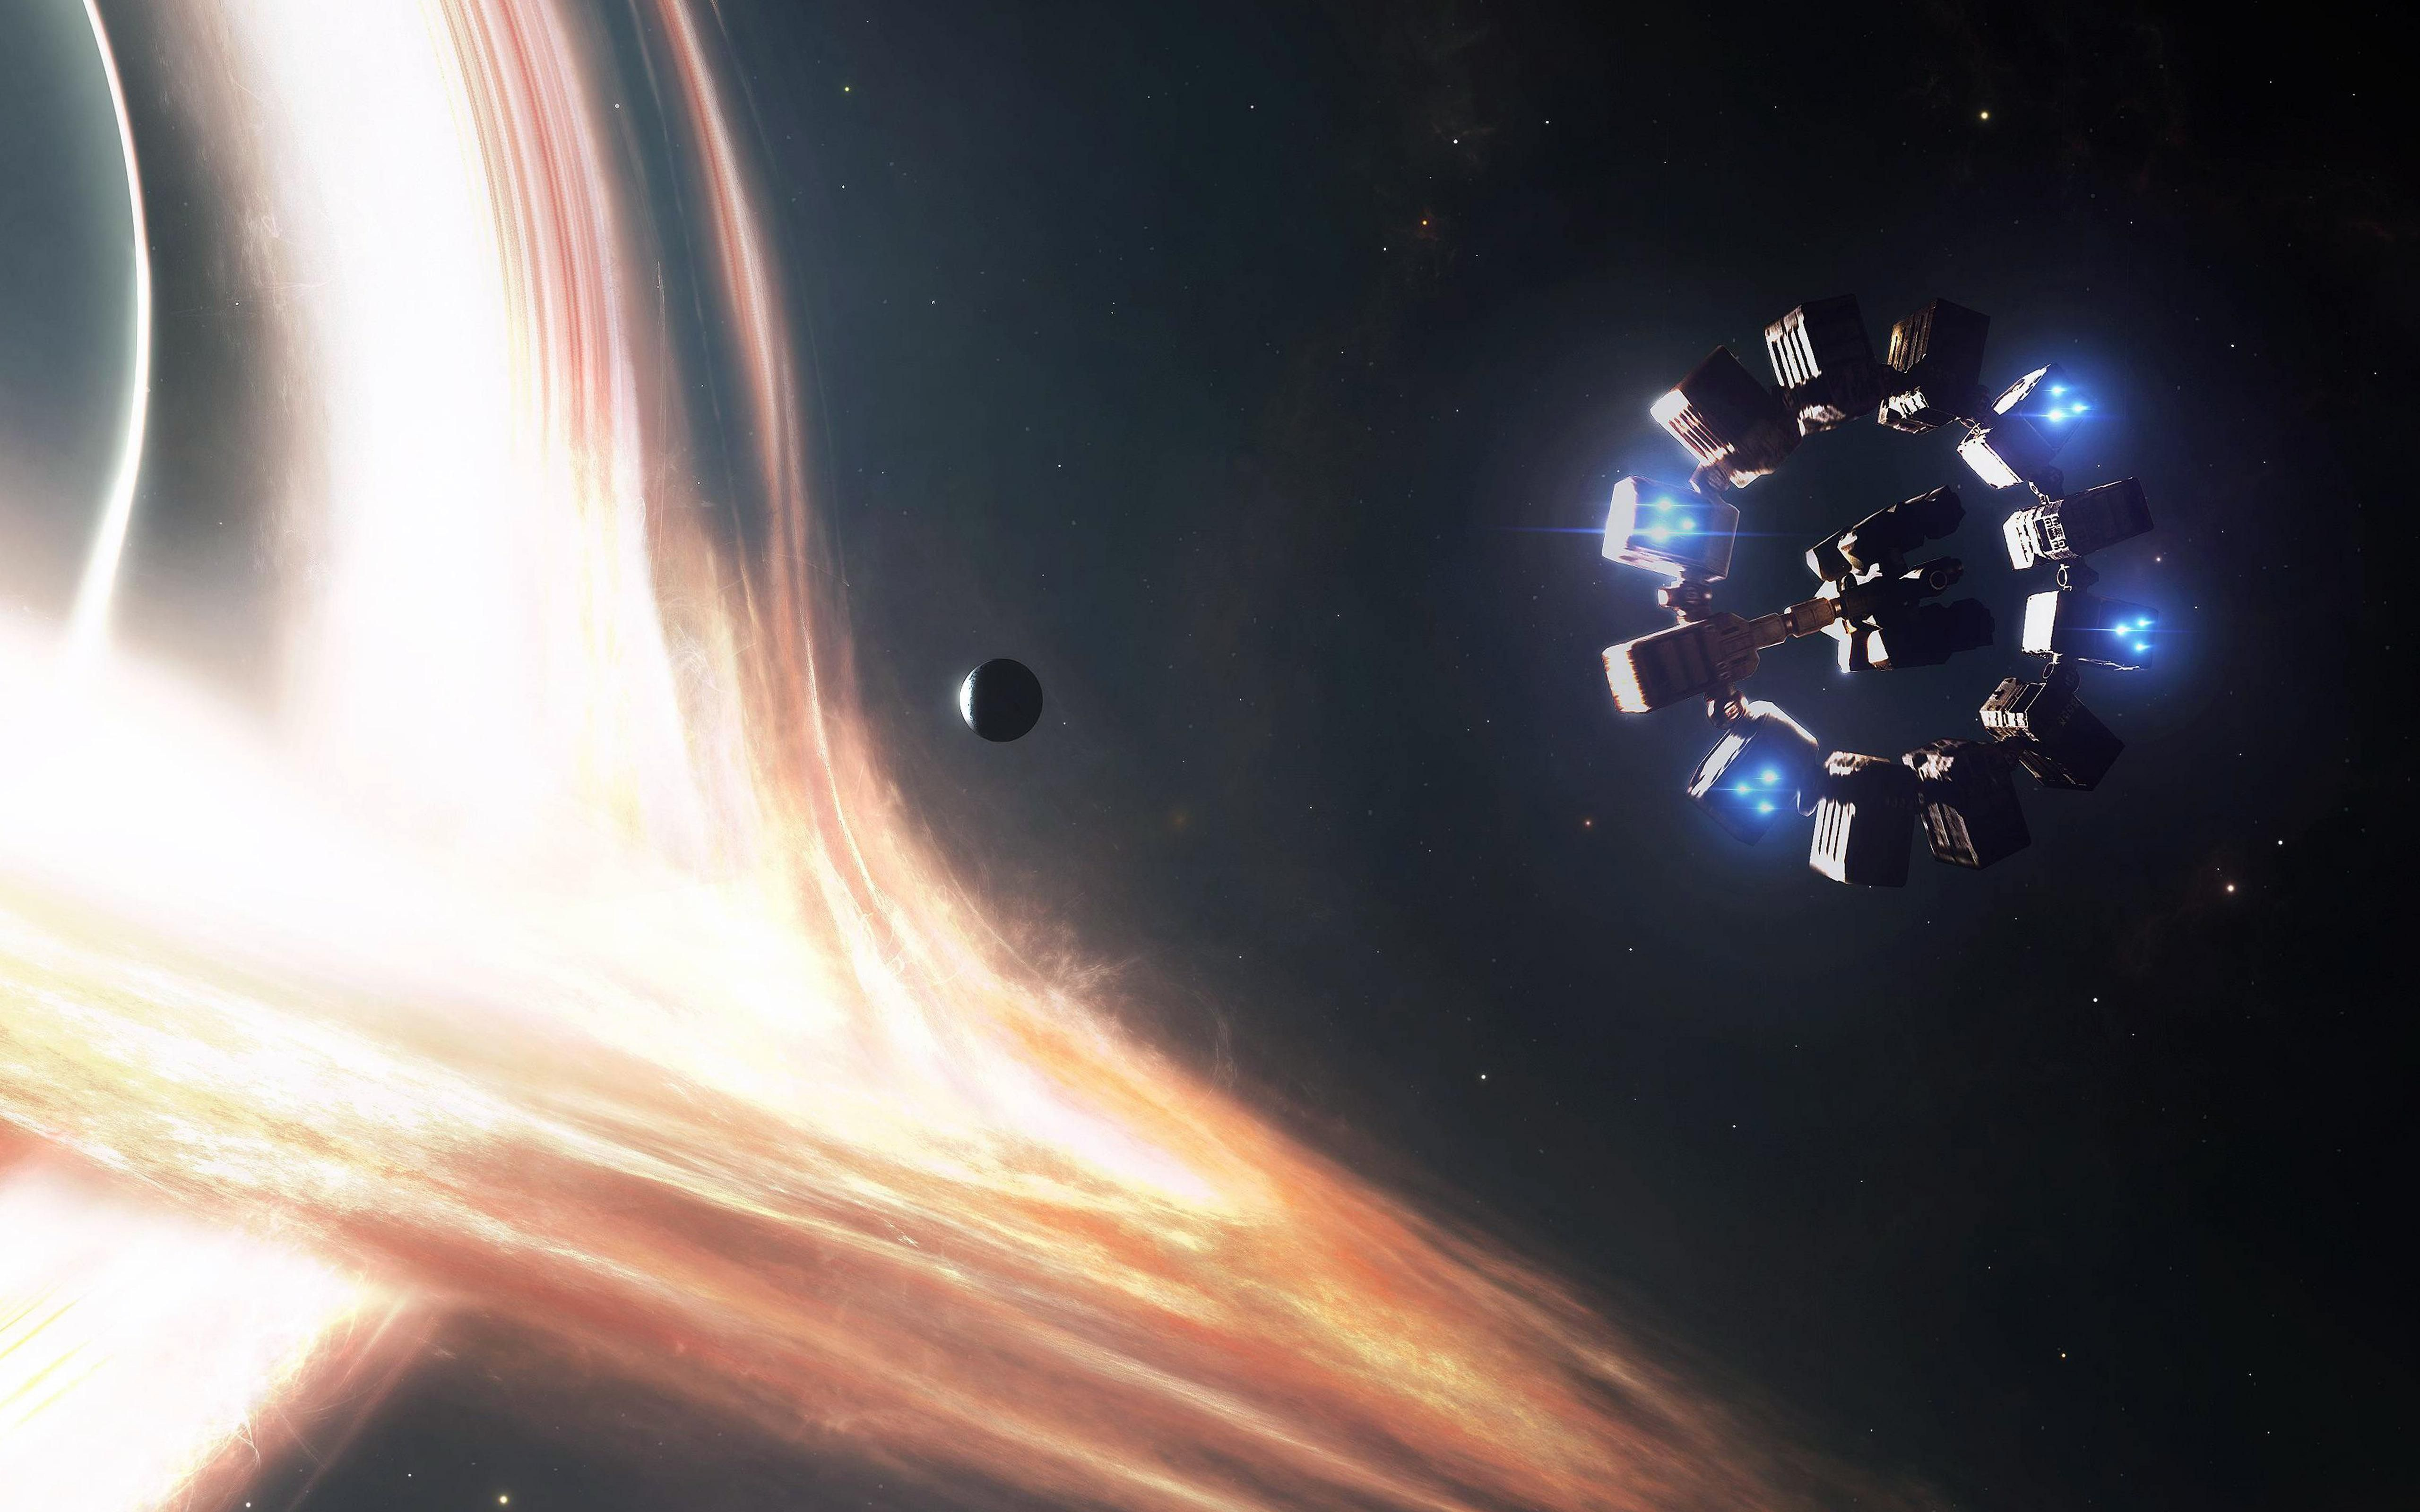 Interstellar Black Hole Wallpapers